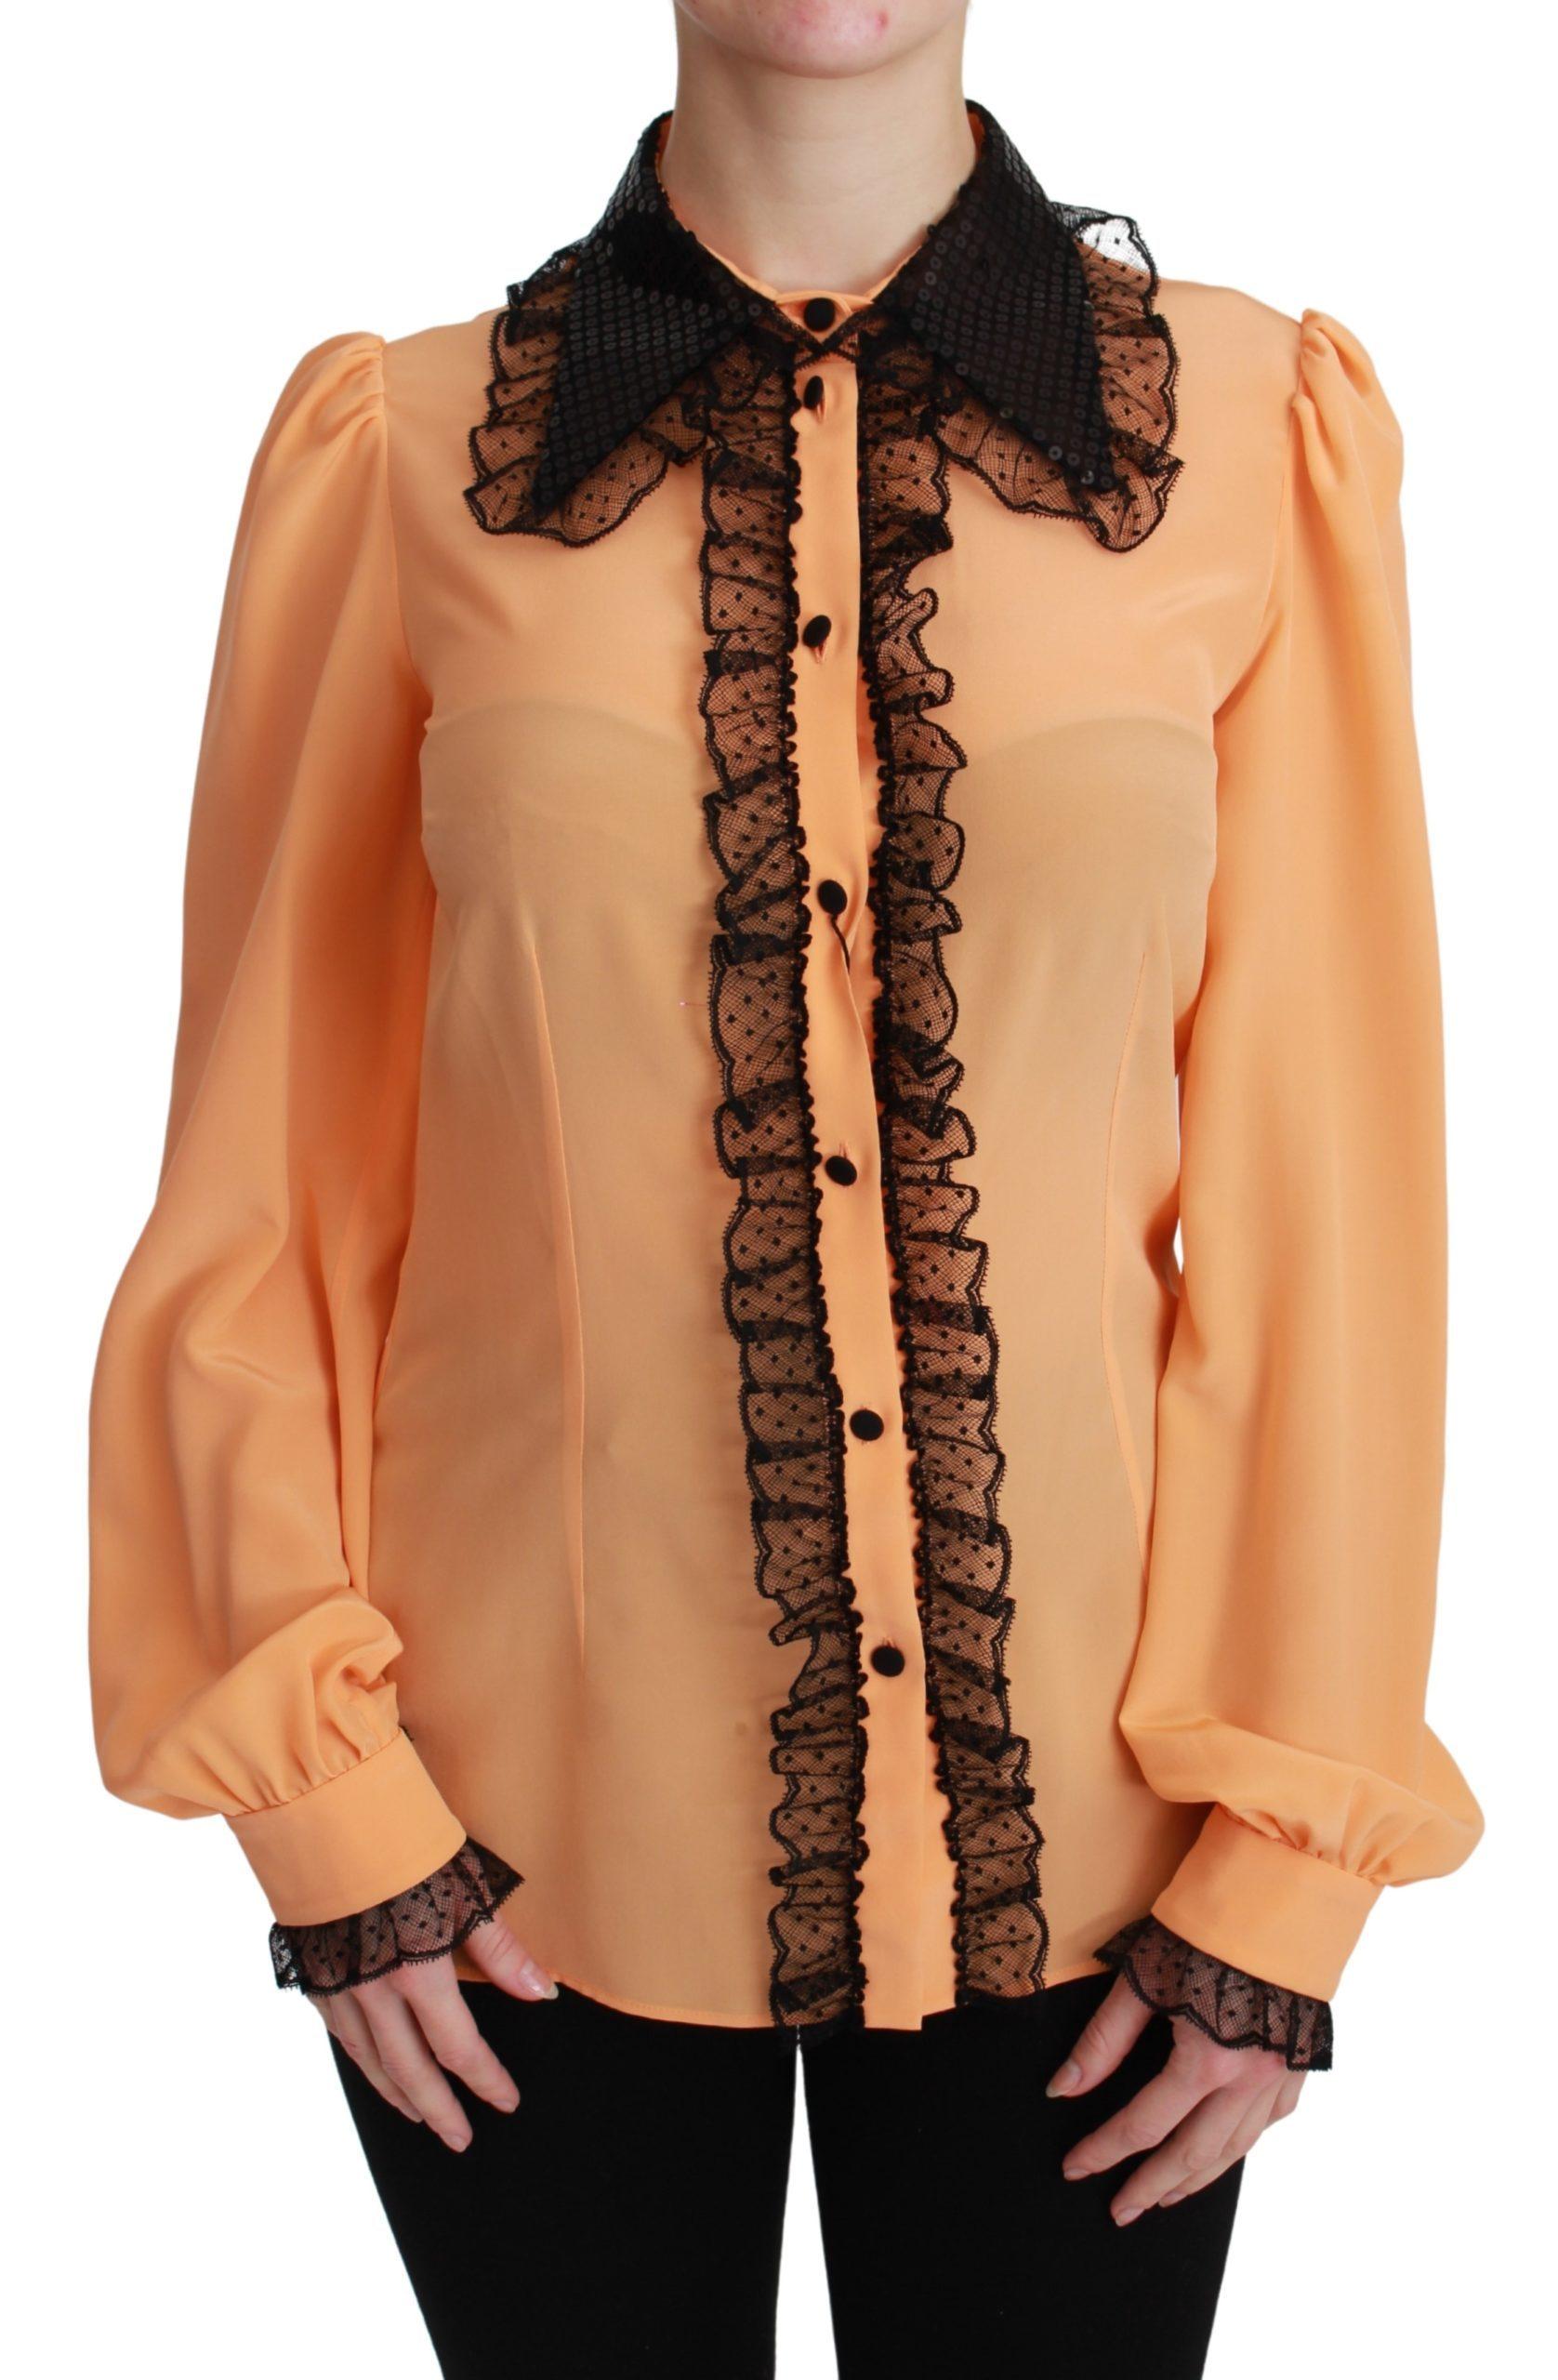 Dolce & Gabbana Women's Silk Sequin Lace Shirt Yellow TSH4662 - IT38 | S